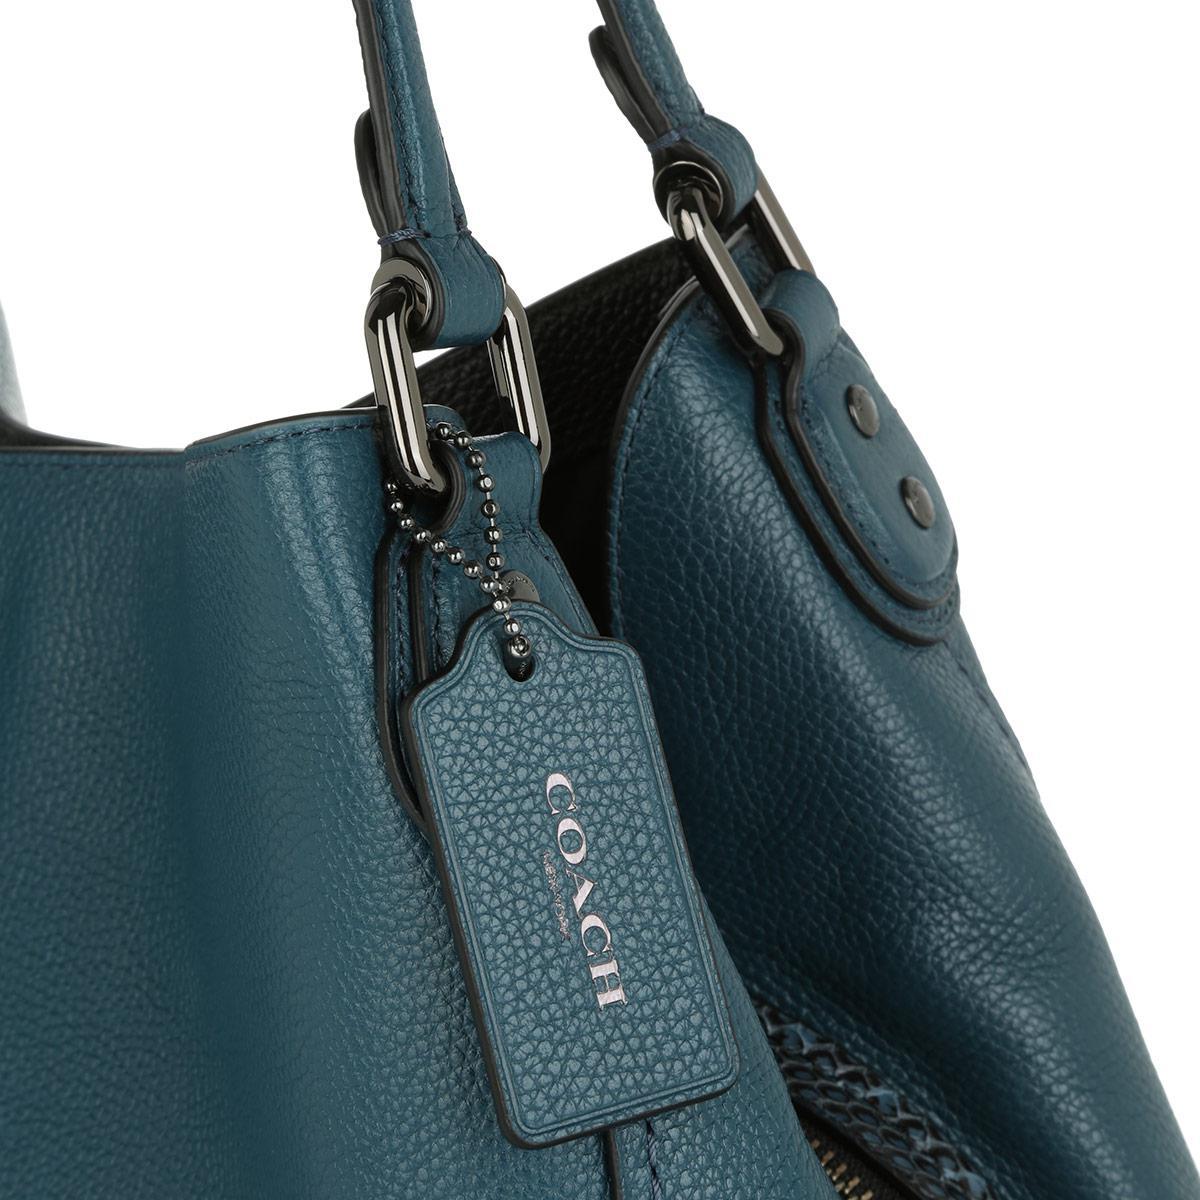 632fb1fc8bc34 COACH Colorblock Edie Shoulder Bag 31 Mixed Materials Dark Gunmetal ...